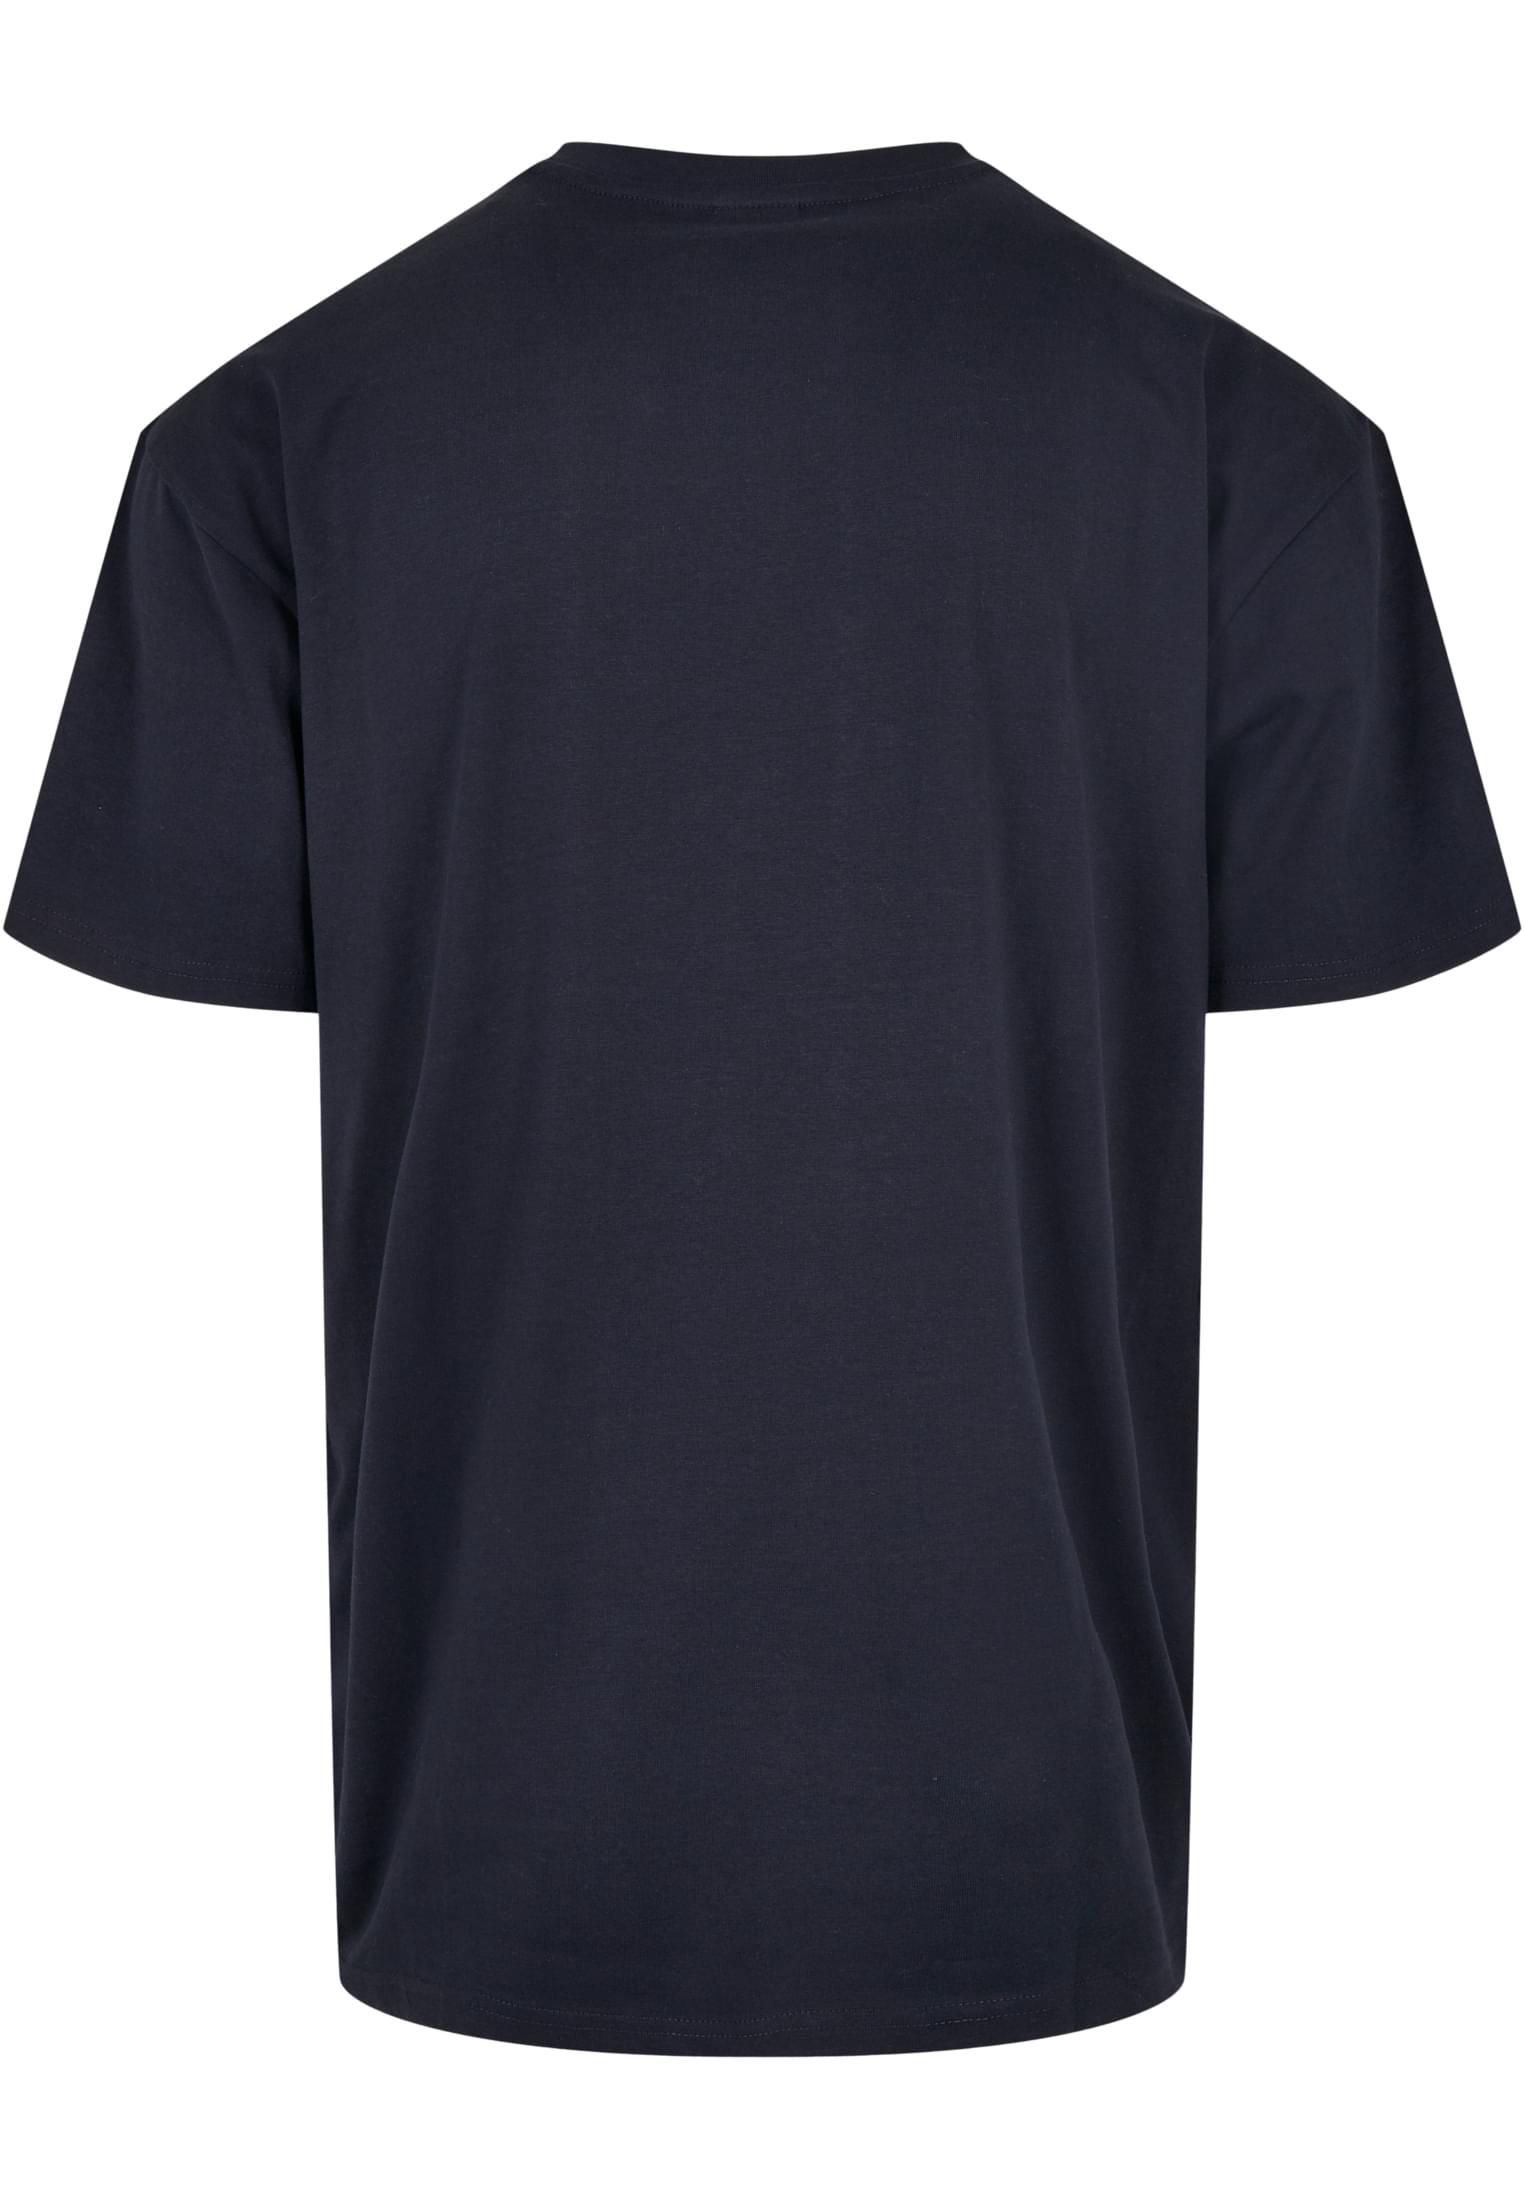 Urban Classics Oversized tee Camiseta para Hombre